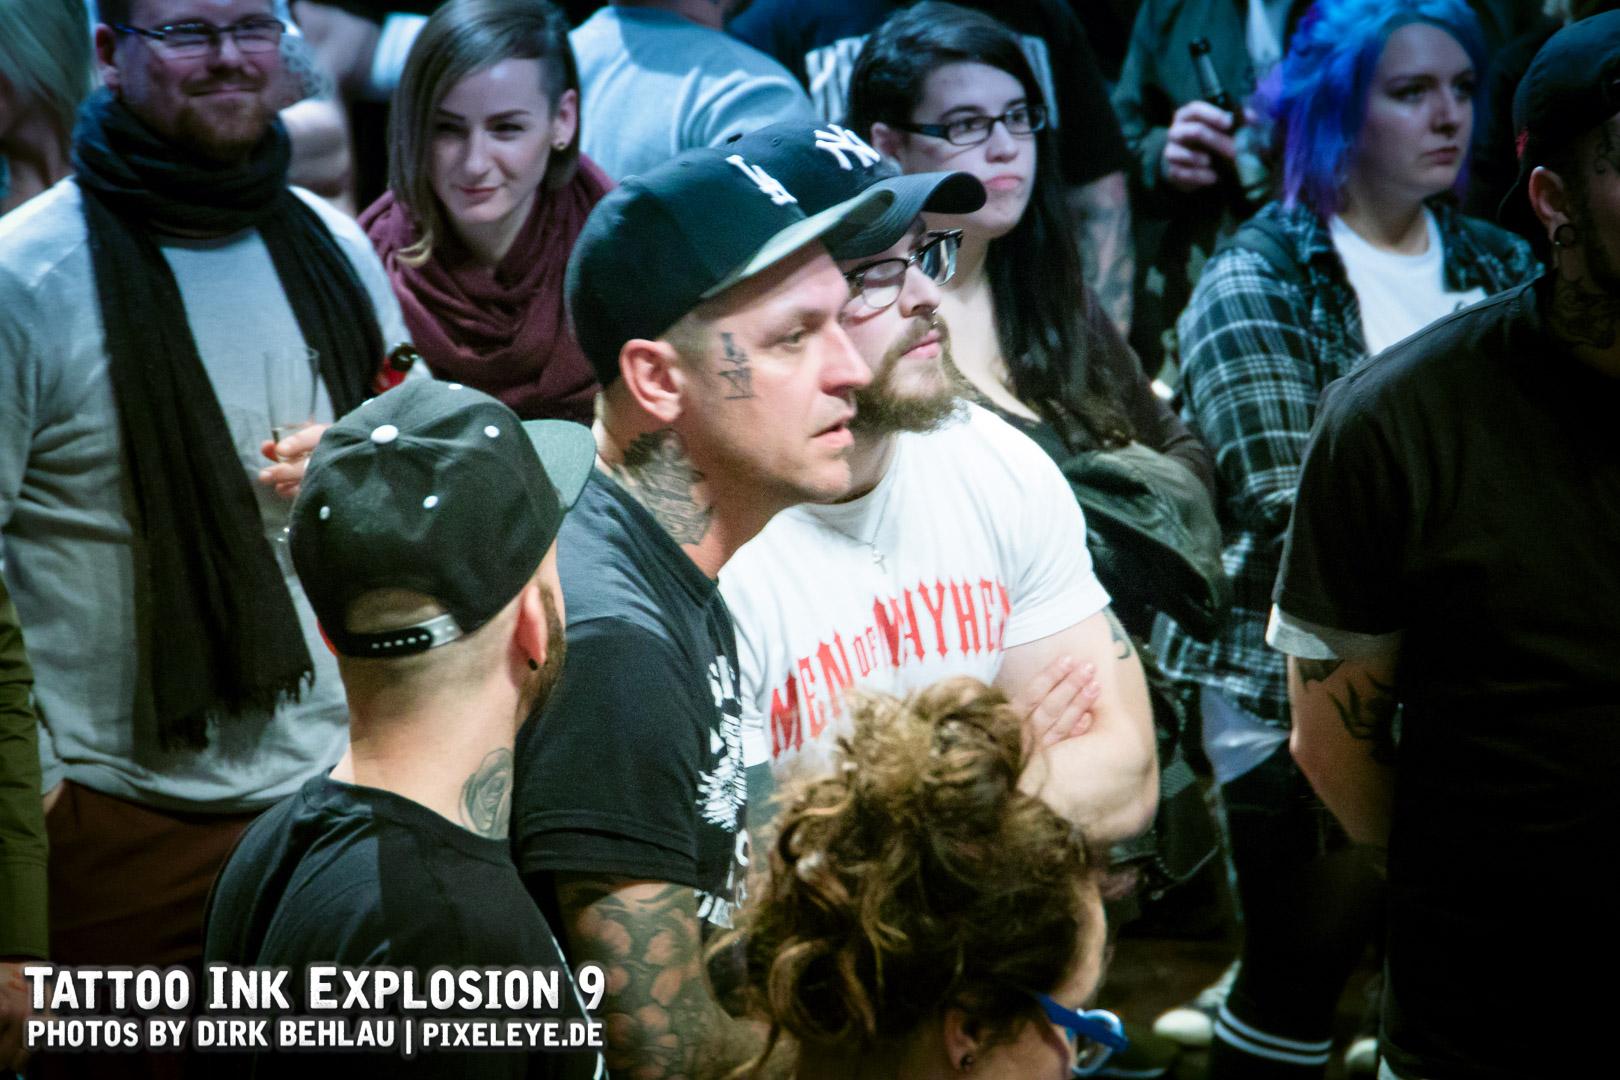 Tattoo Ink Explosion 2018 WEB by Dirk Behlau-0902.jpg